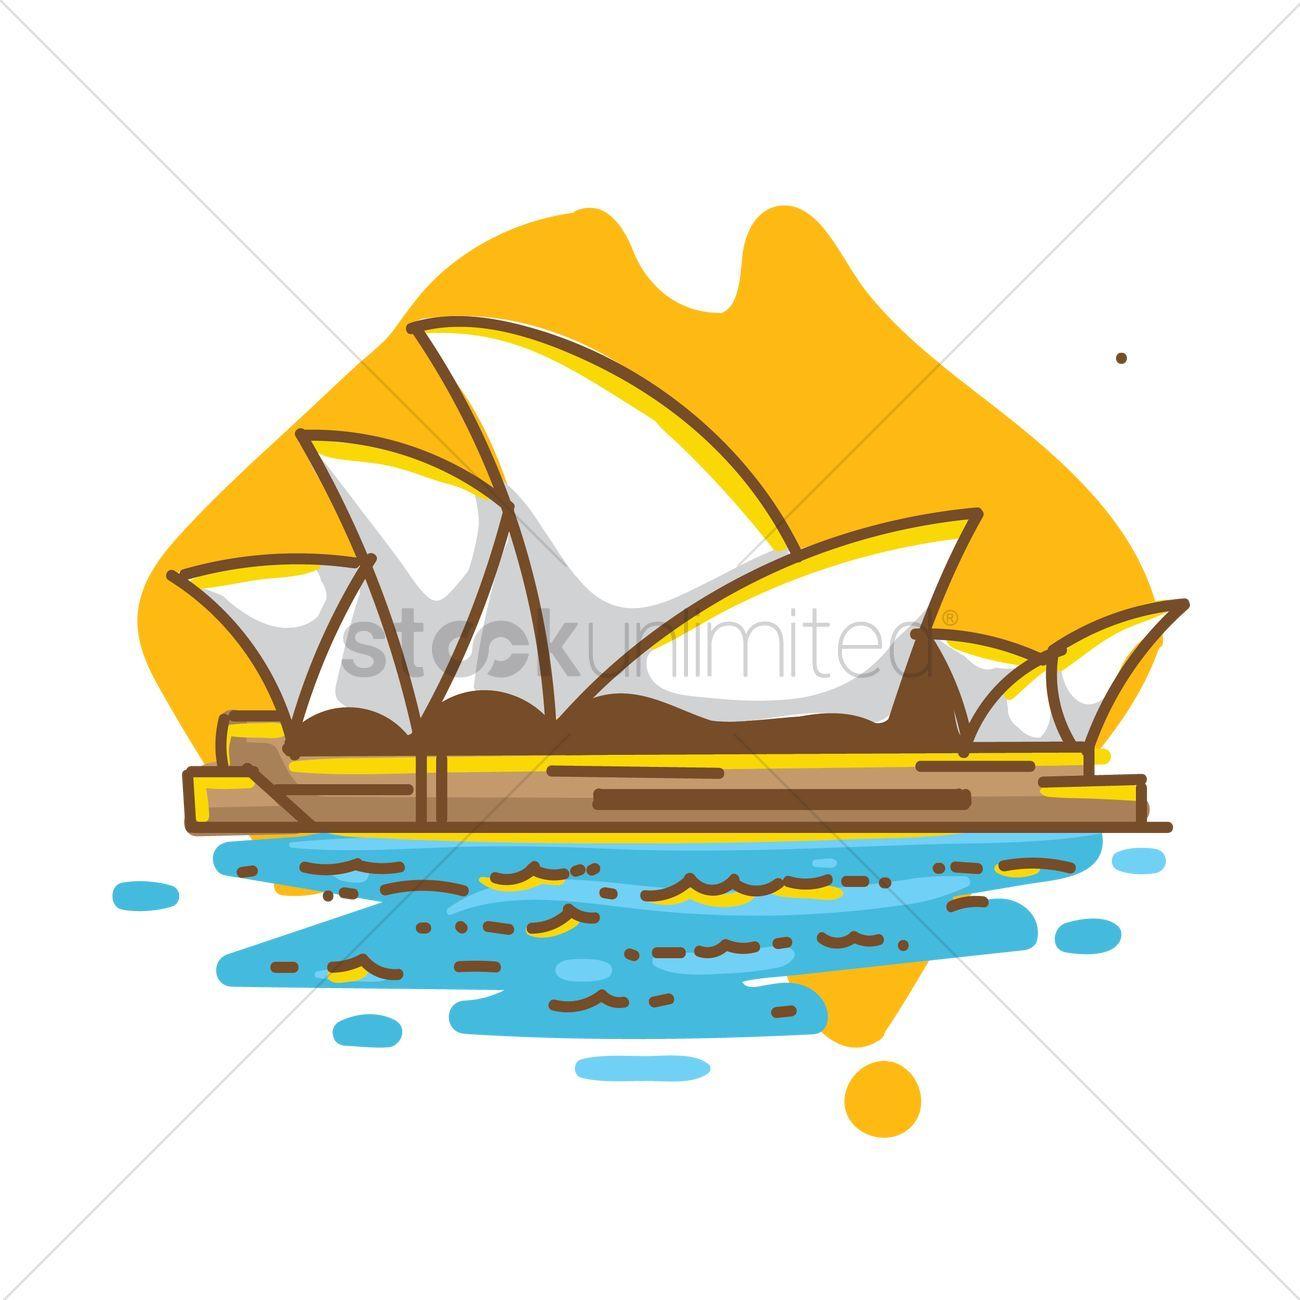 Sydney opera house clipart 1 » Clipart Portal.